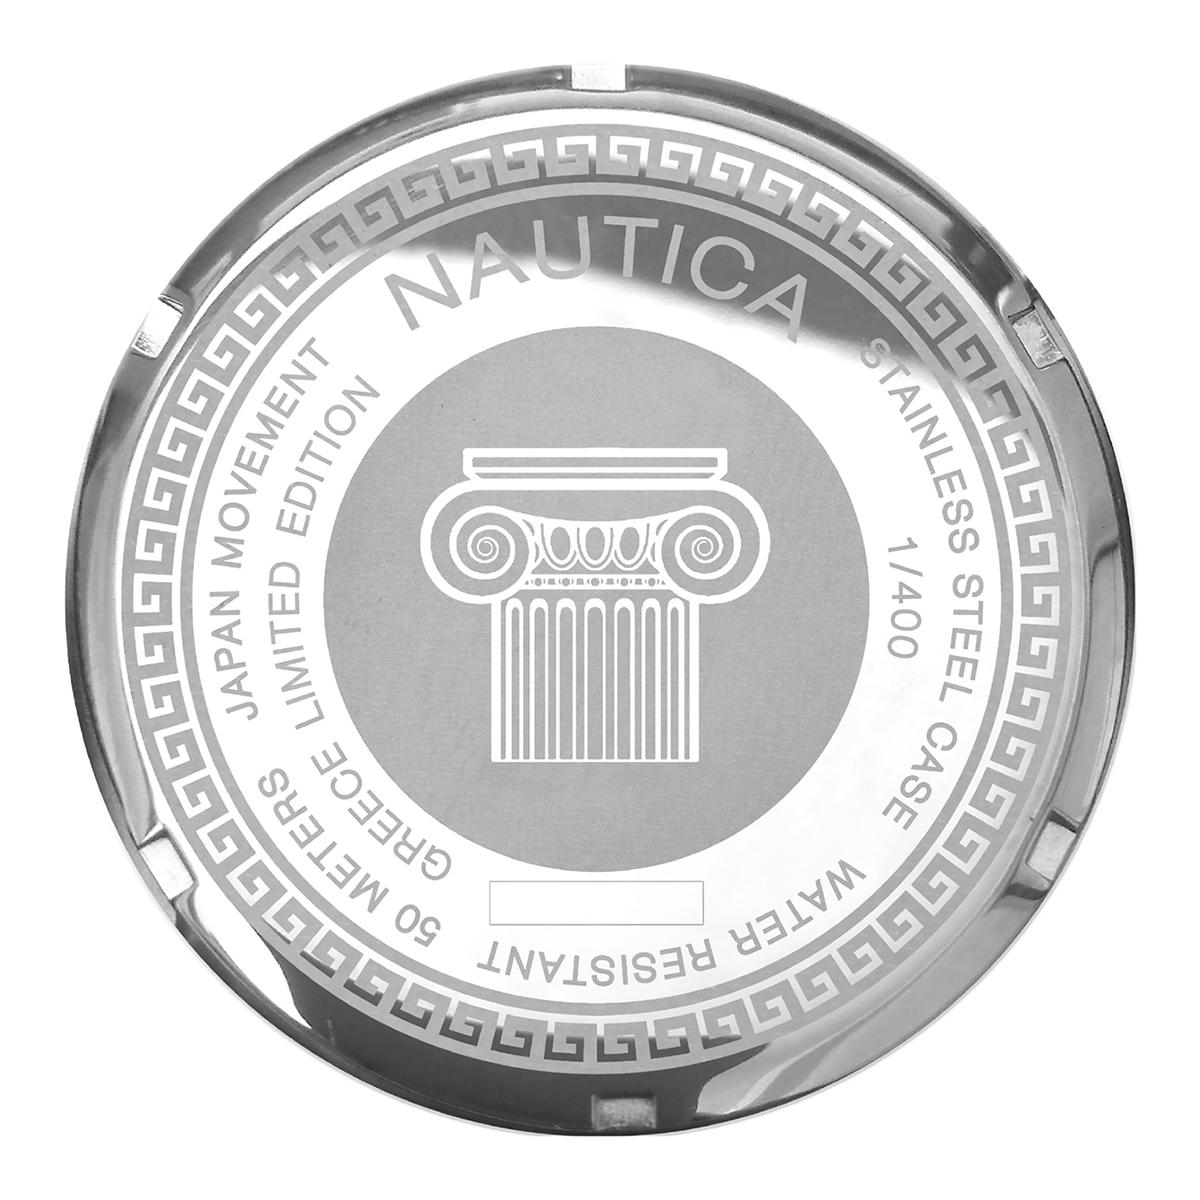 NAUTICA GREEK LIMITED EDITION WATCH CASEBACK